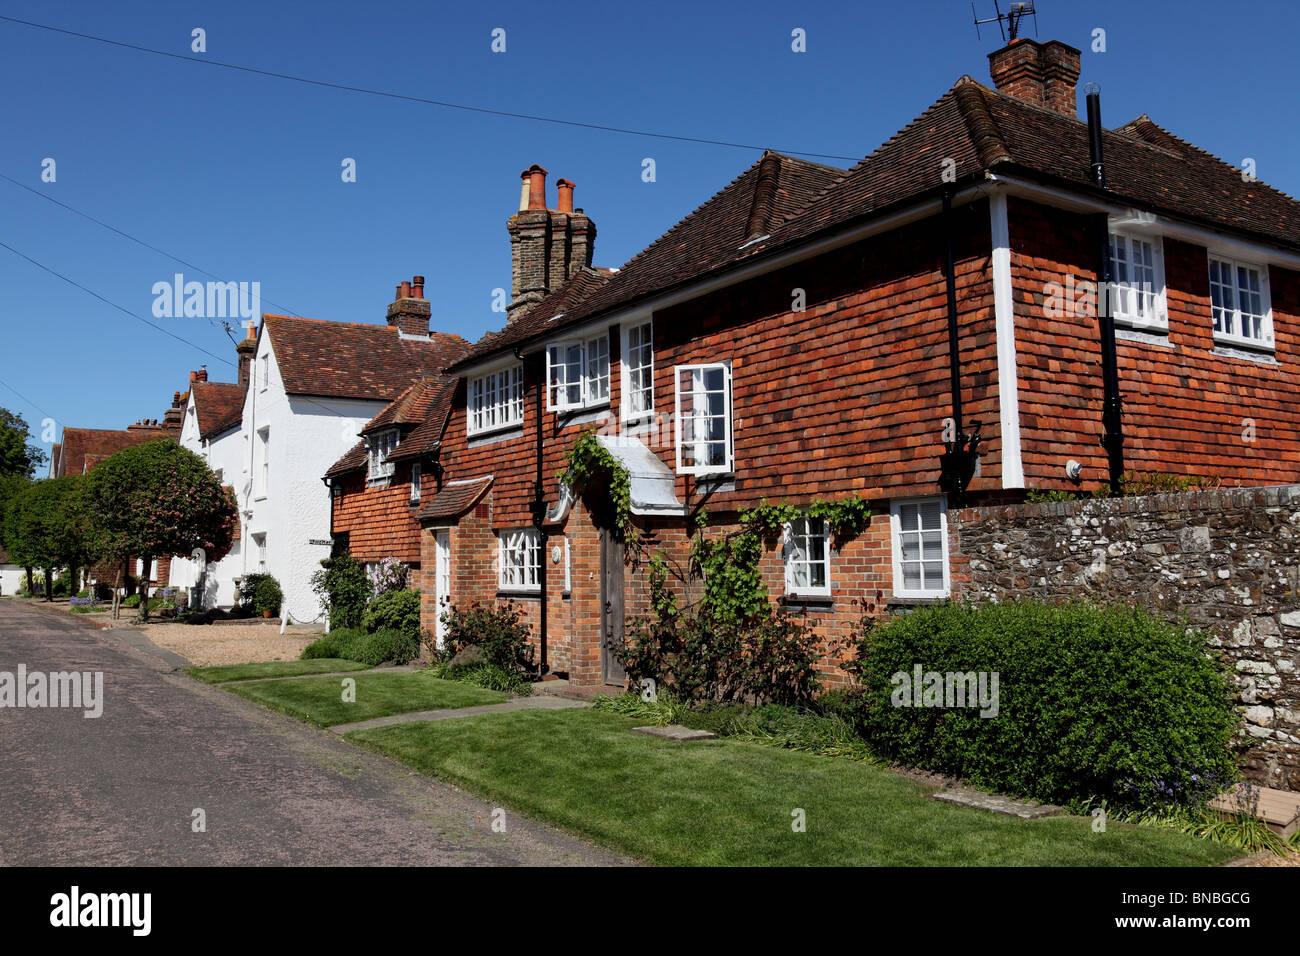 3190. Barrack Square, Winchelsea, East Sussex, UK - Stock Image